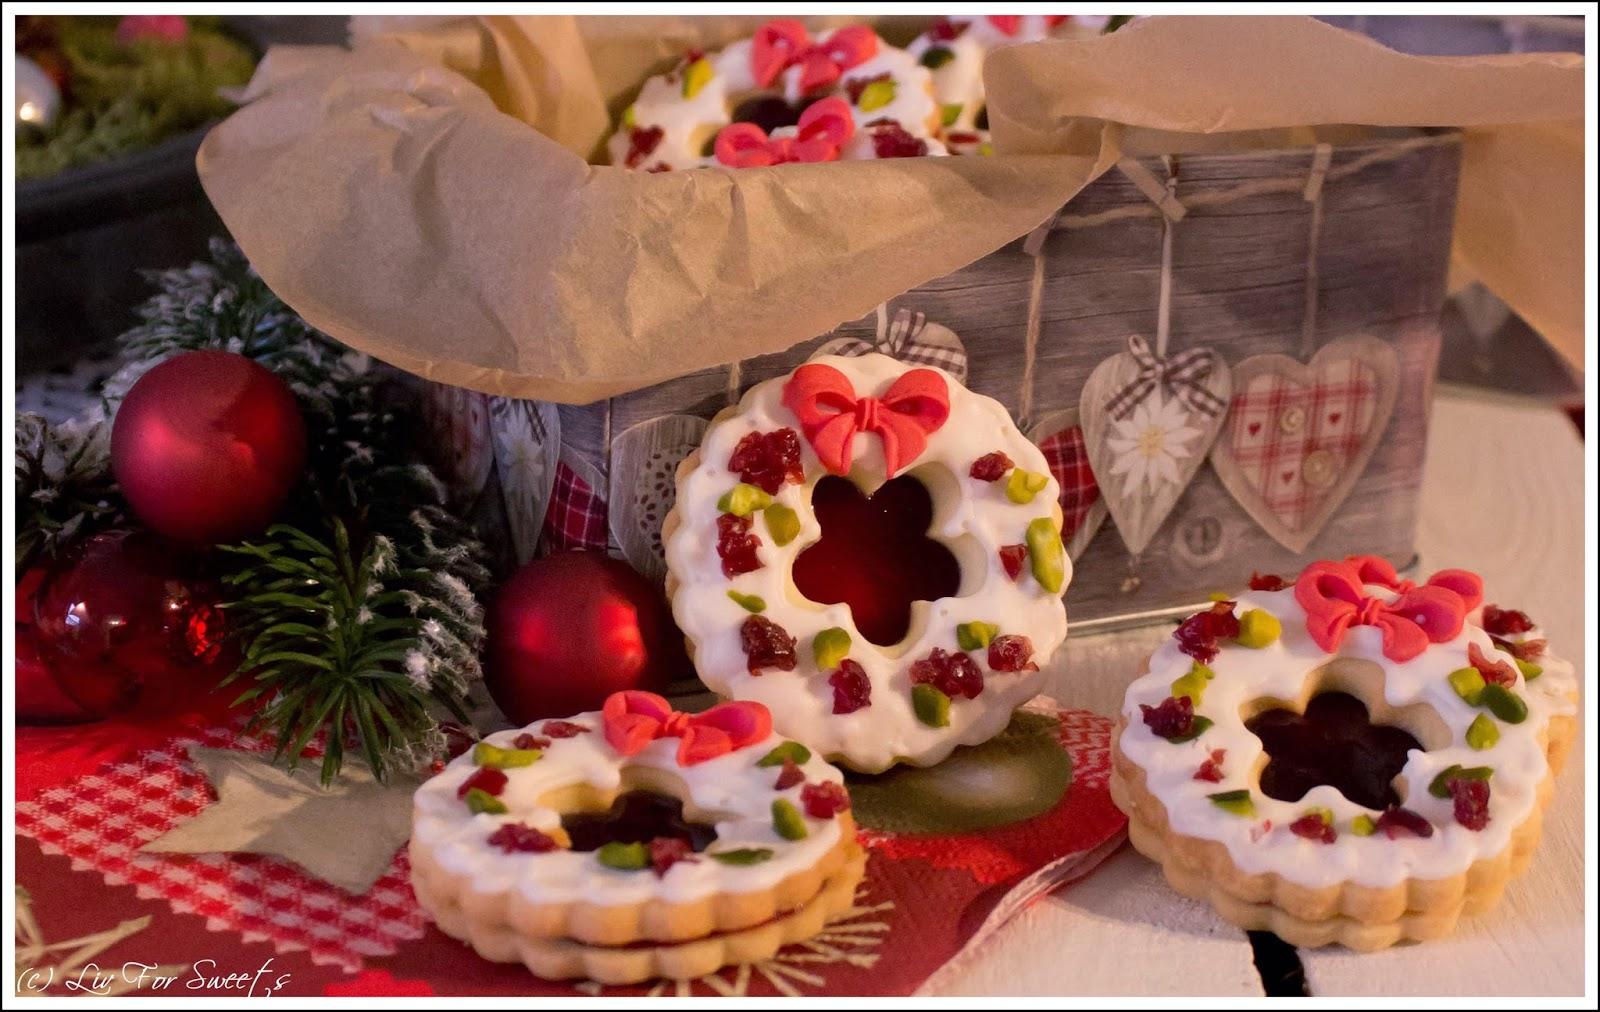 liv for sweets weihnachtsb ckerei weihnachtskranz kekse. Black Bedroom Furniture Sets. Home Design Ideas